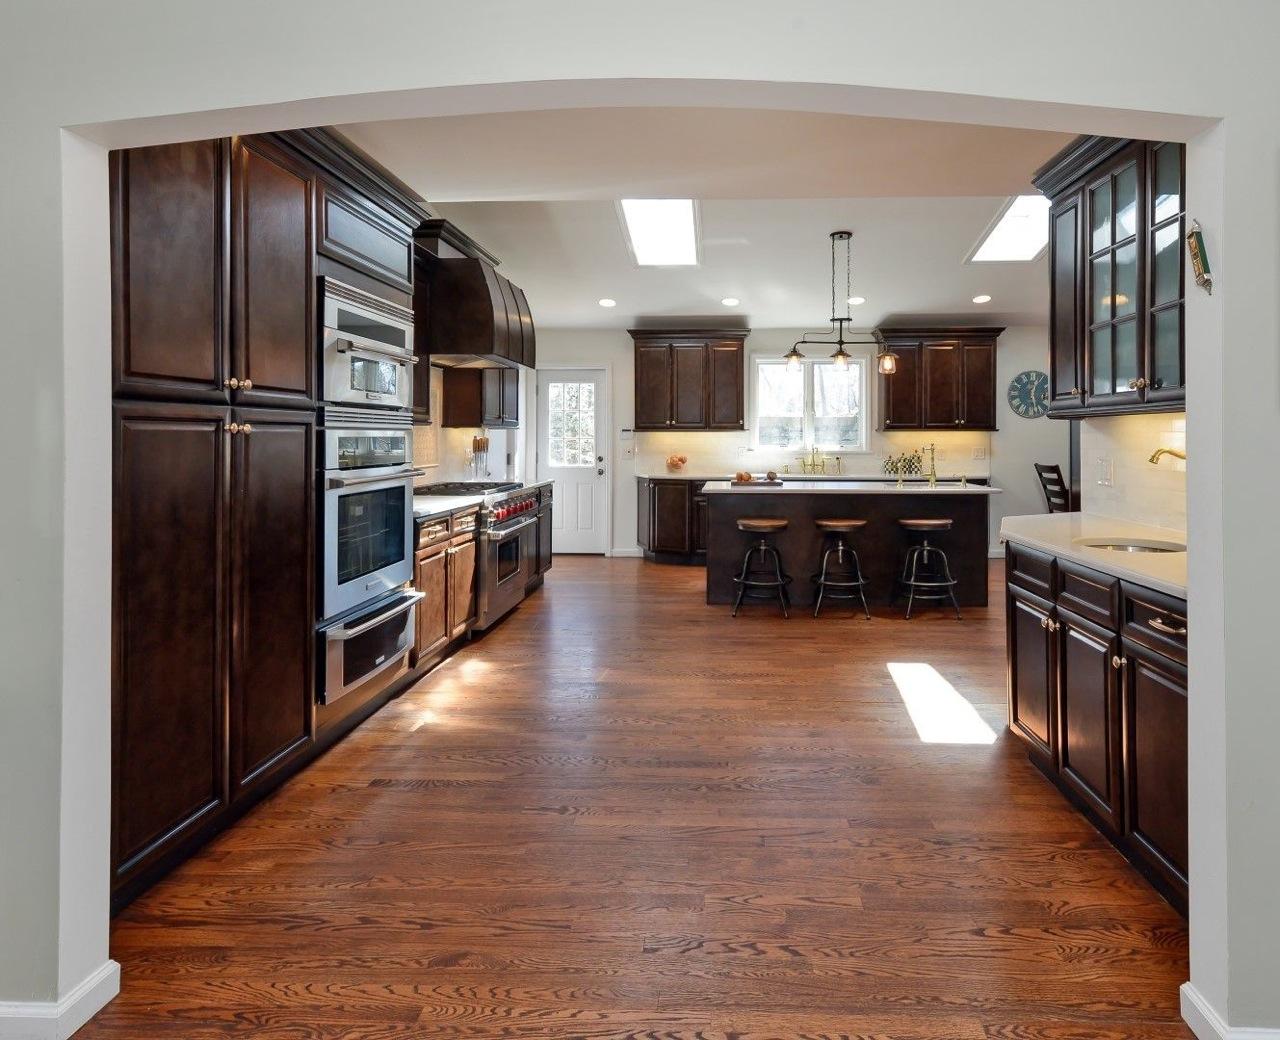 regency espresso pre assembled kitchen cabinets the rta store. Black Bedroom Furniture Sets. Home Design Ideas